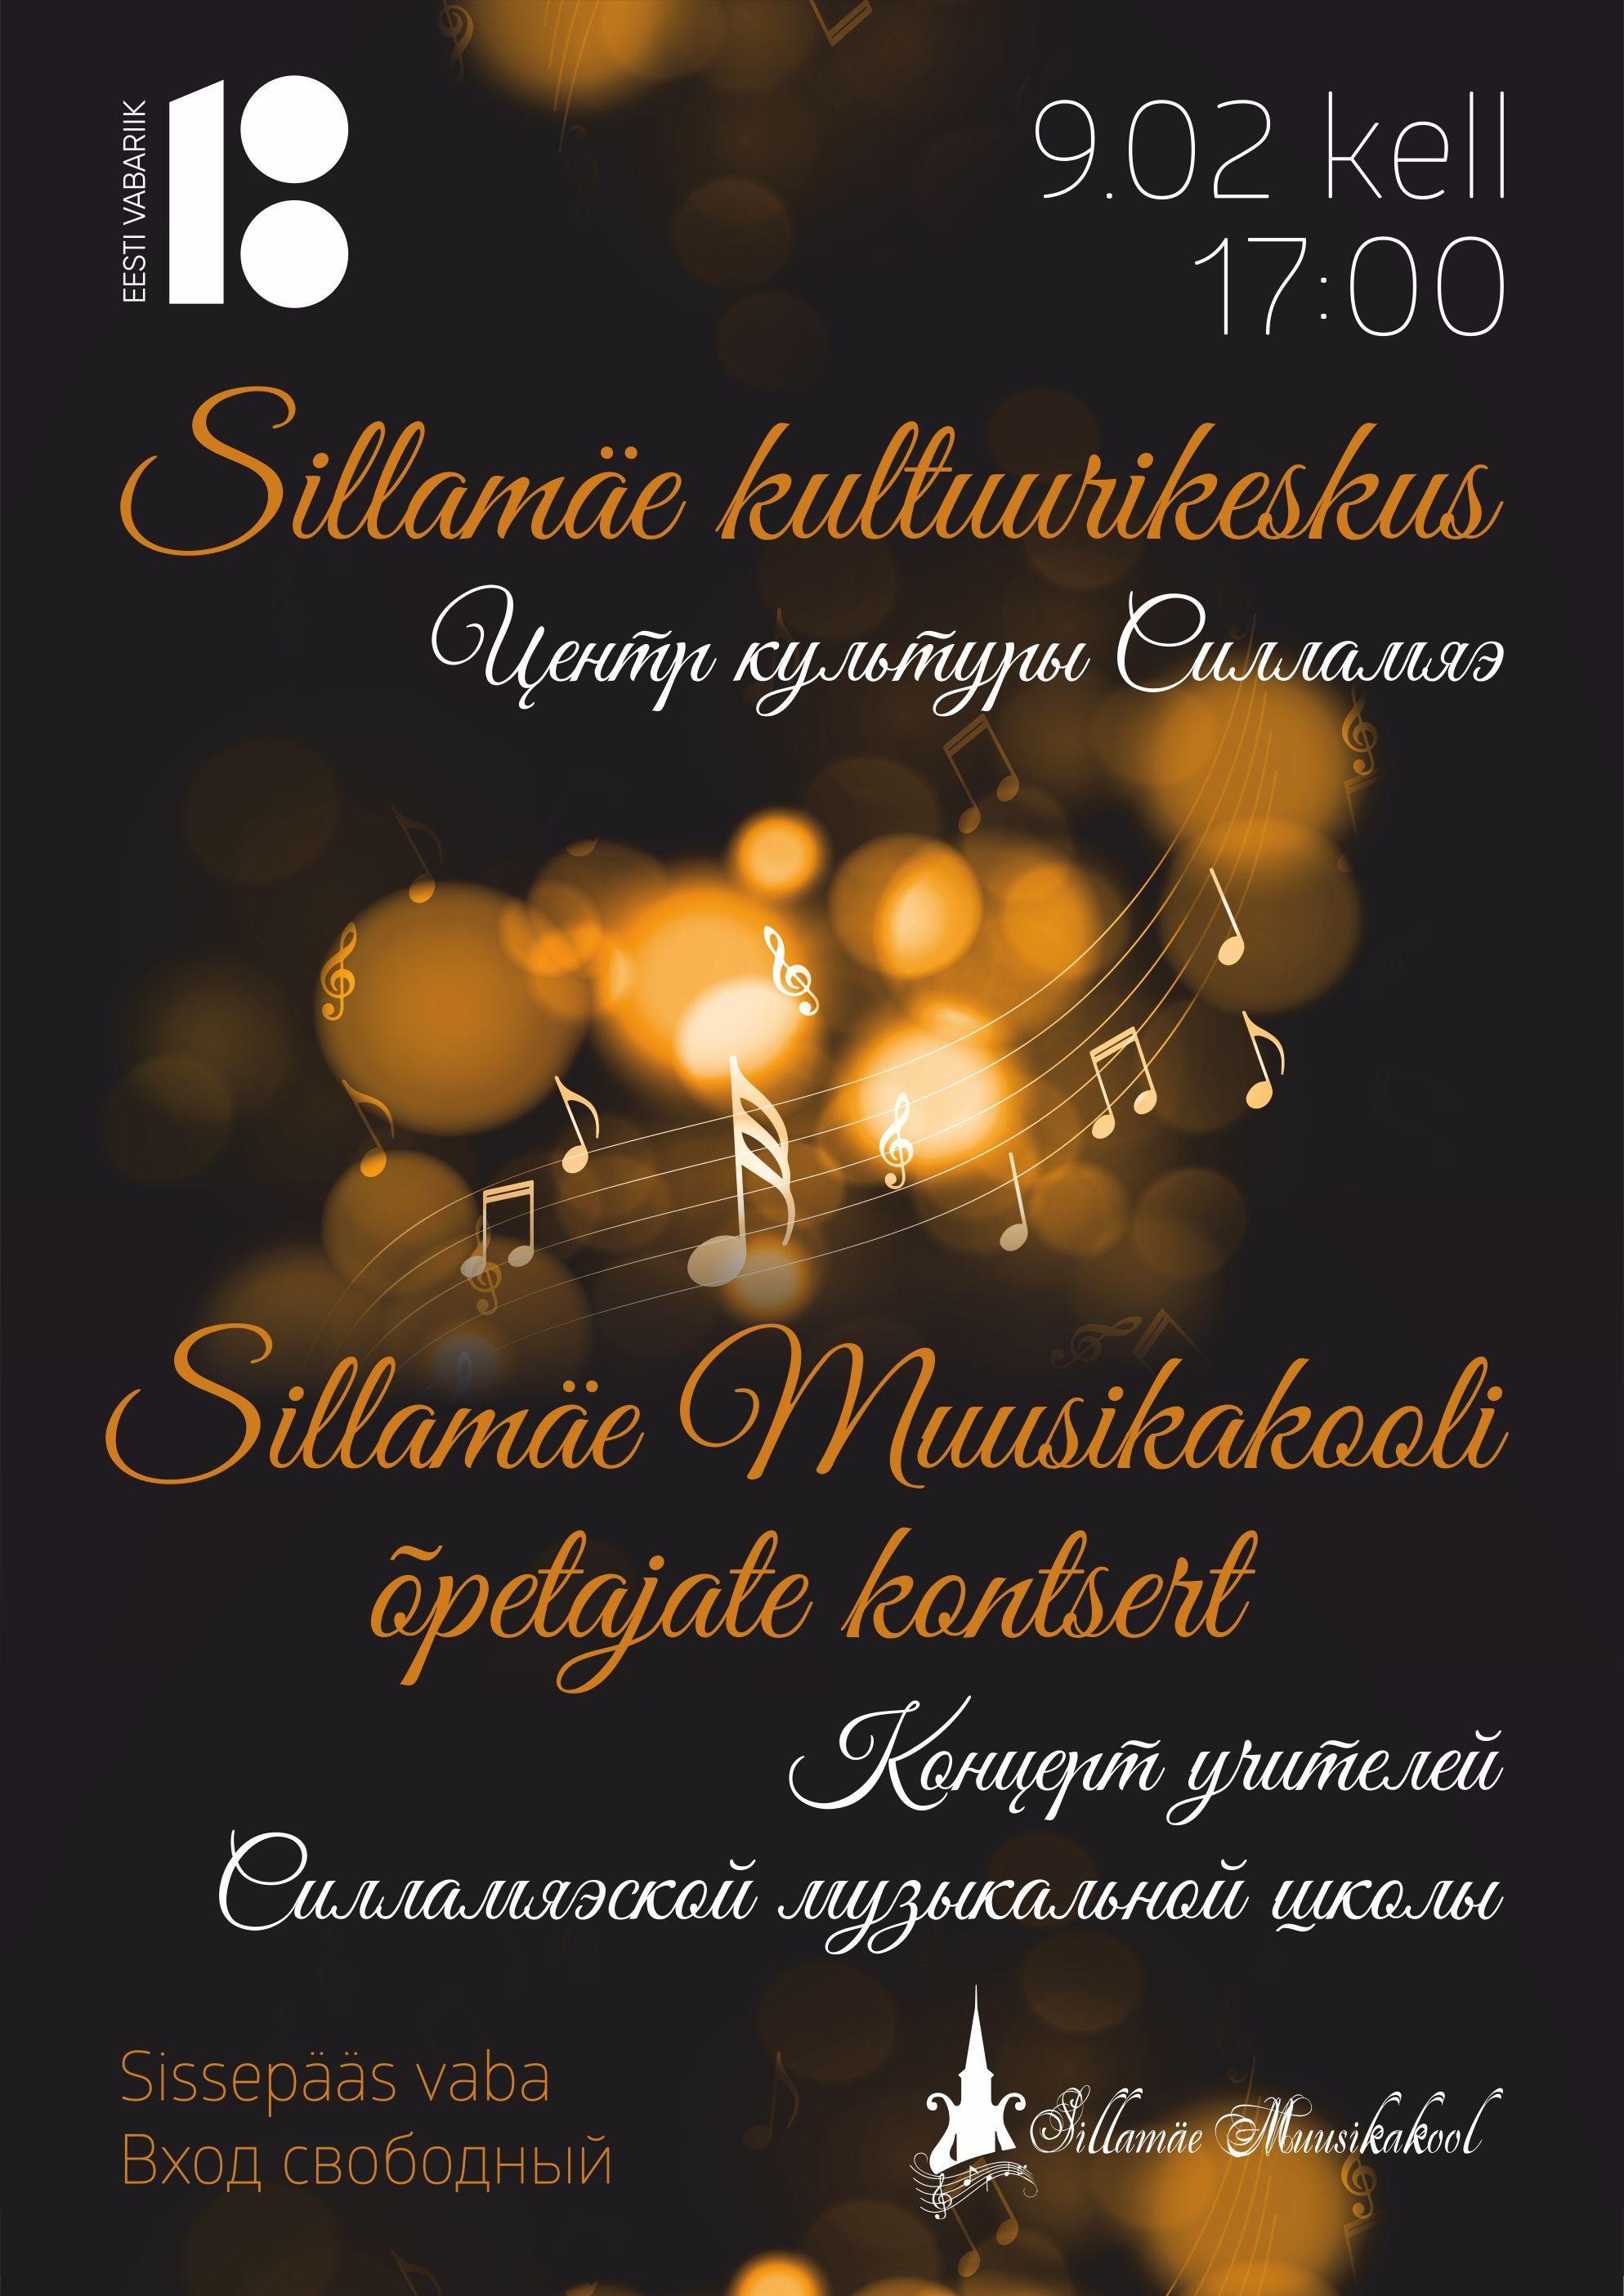 Sillam_musikakool_2